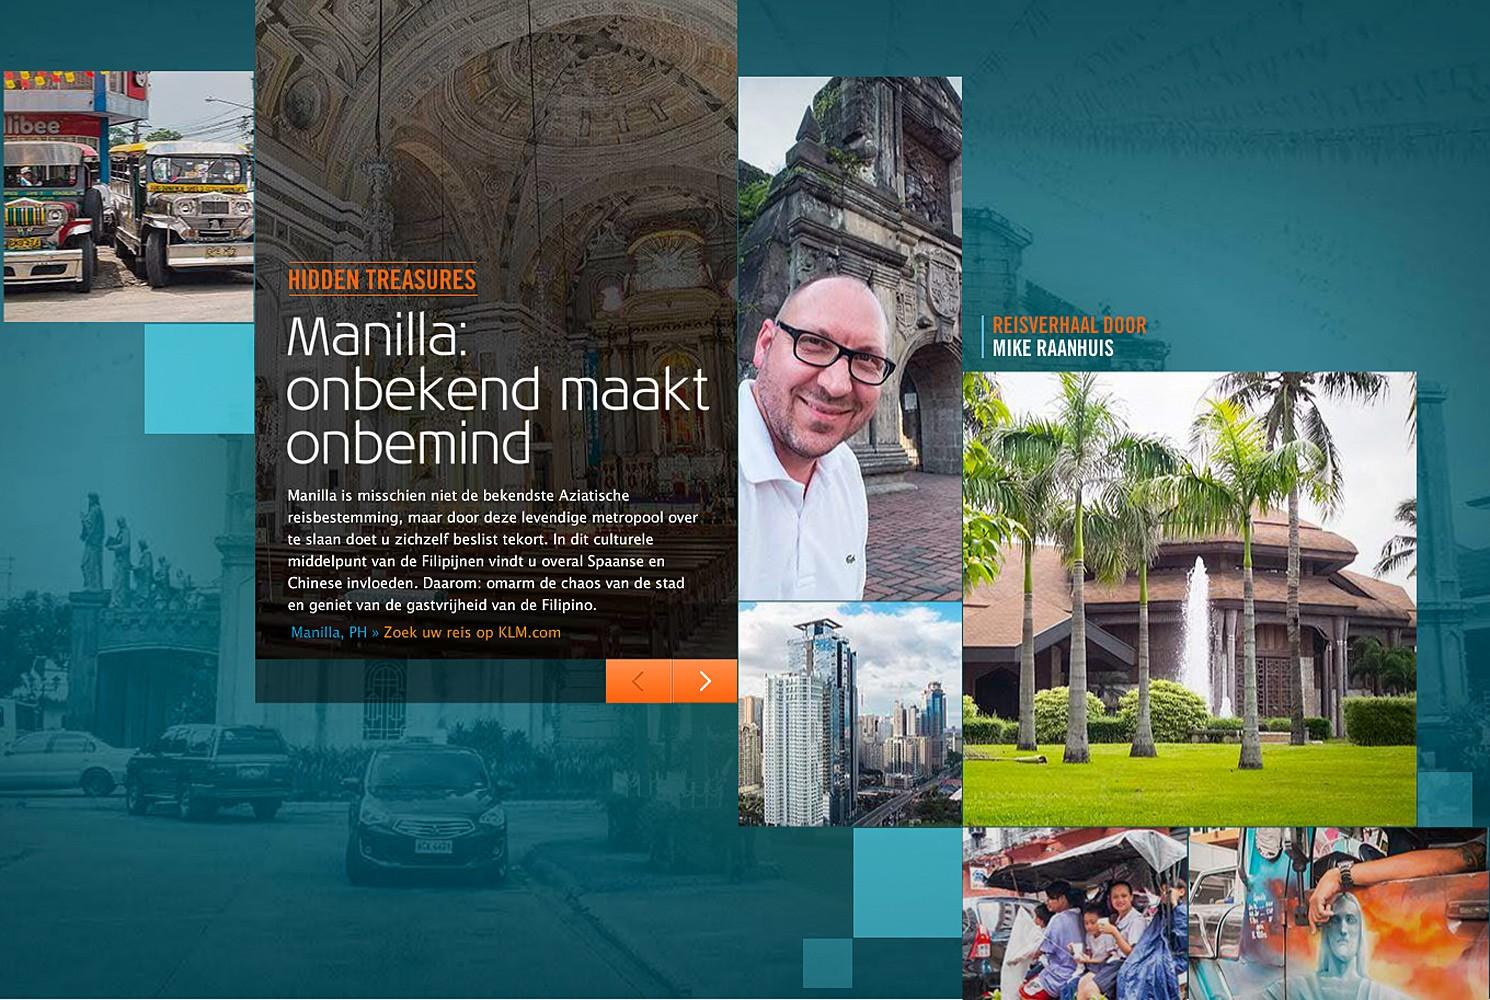 Travel reports Manilla